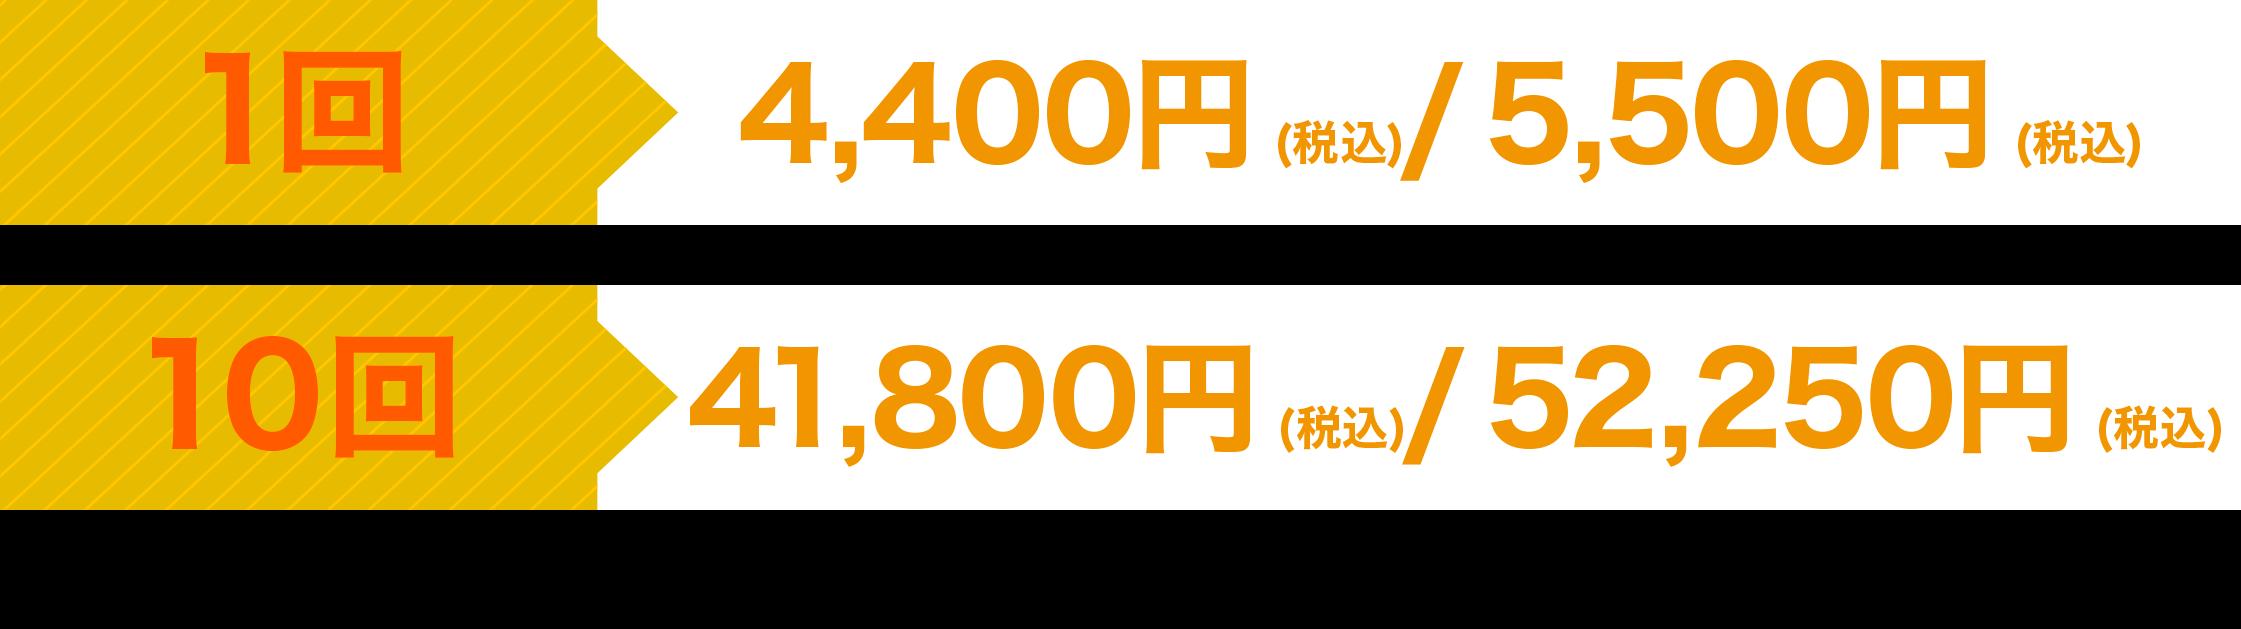 1回4,400円/5,500円 10回41,800円/52,250円